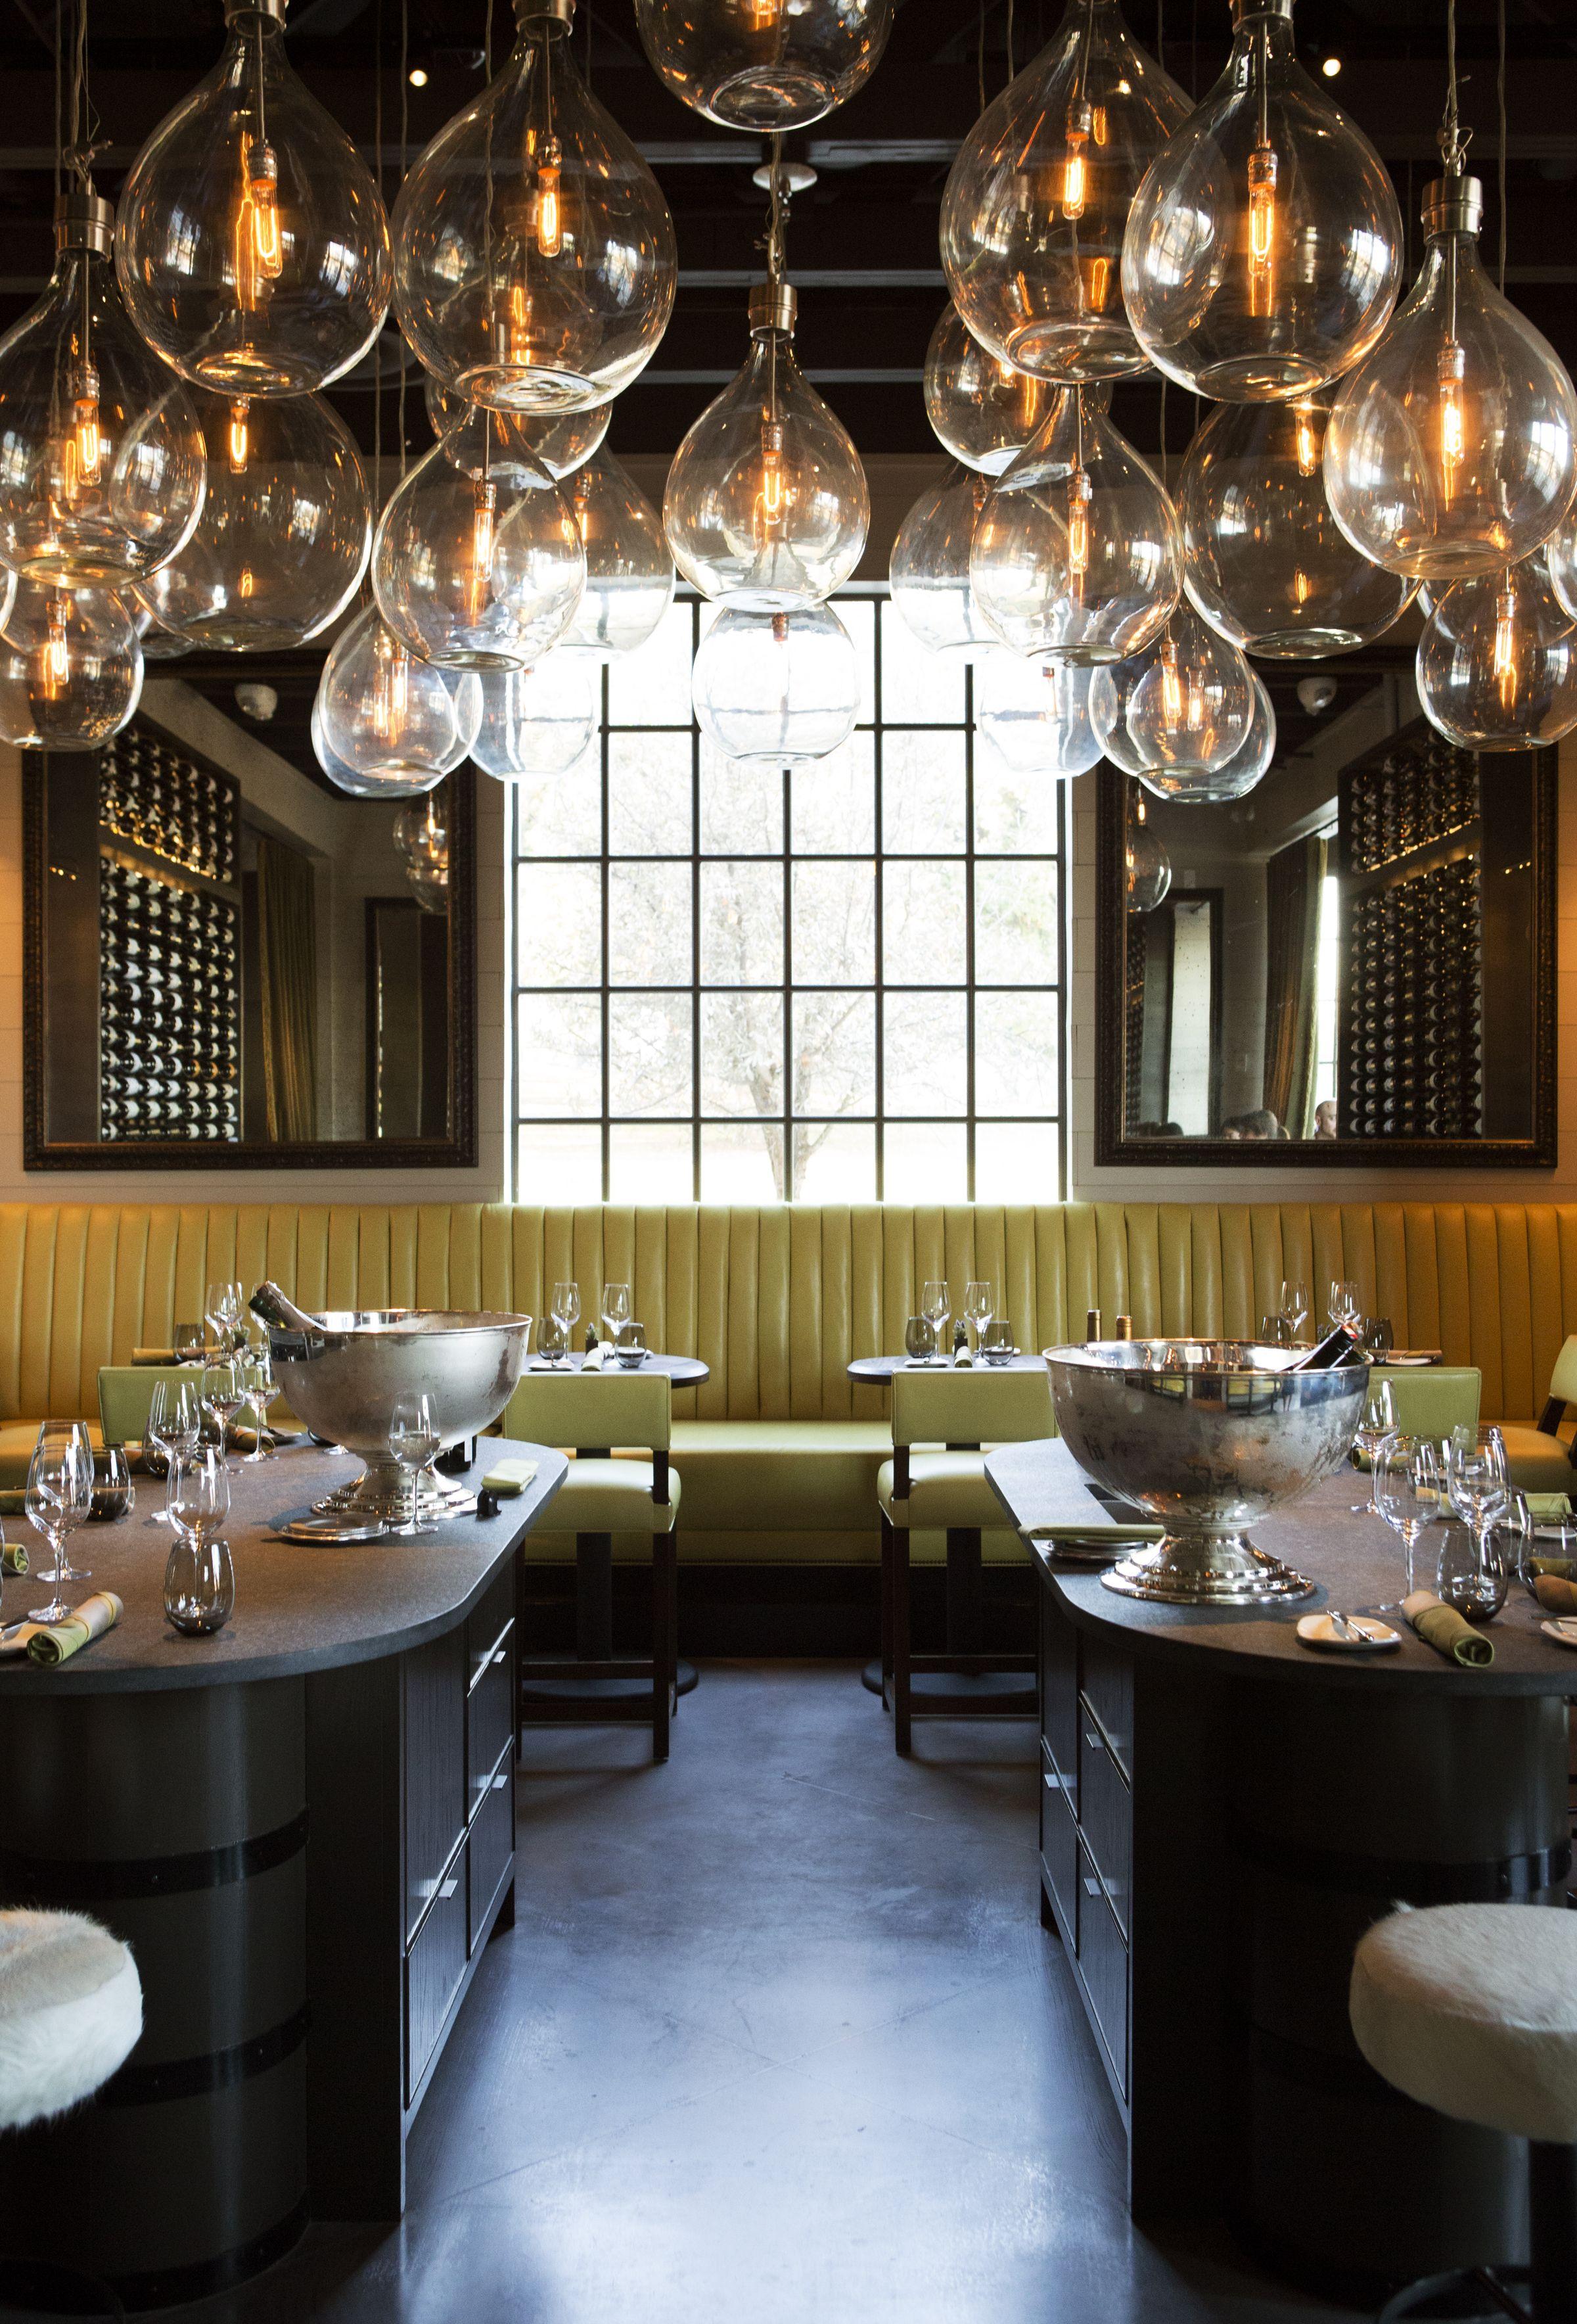 LaV Restaurant, Austin, TX By Mcalpine Tankersley